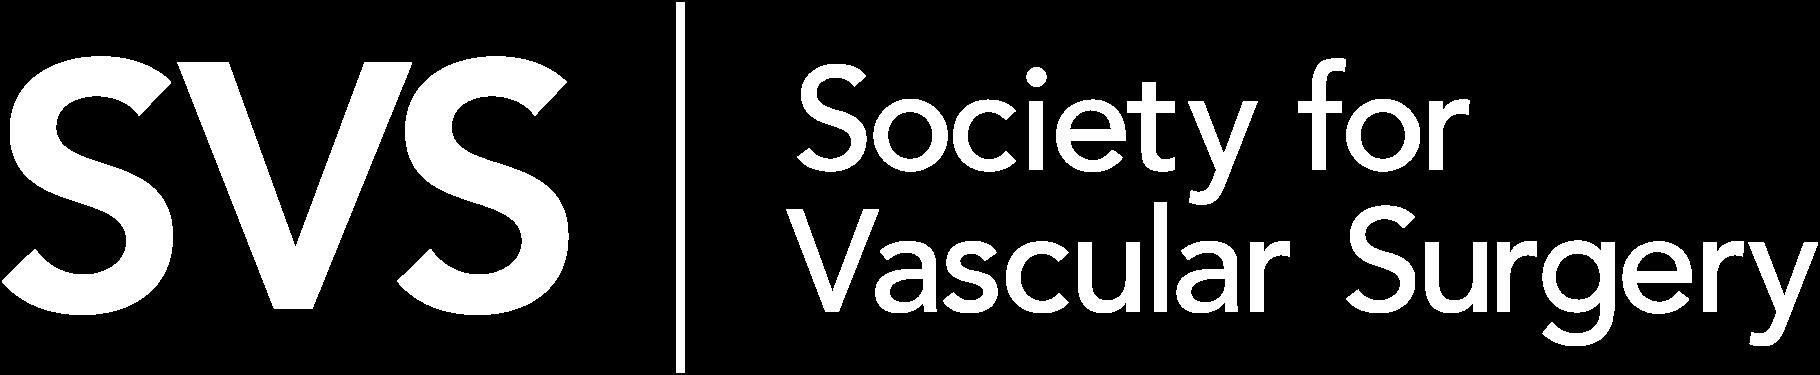 Society for Vascular Surgery